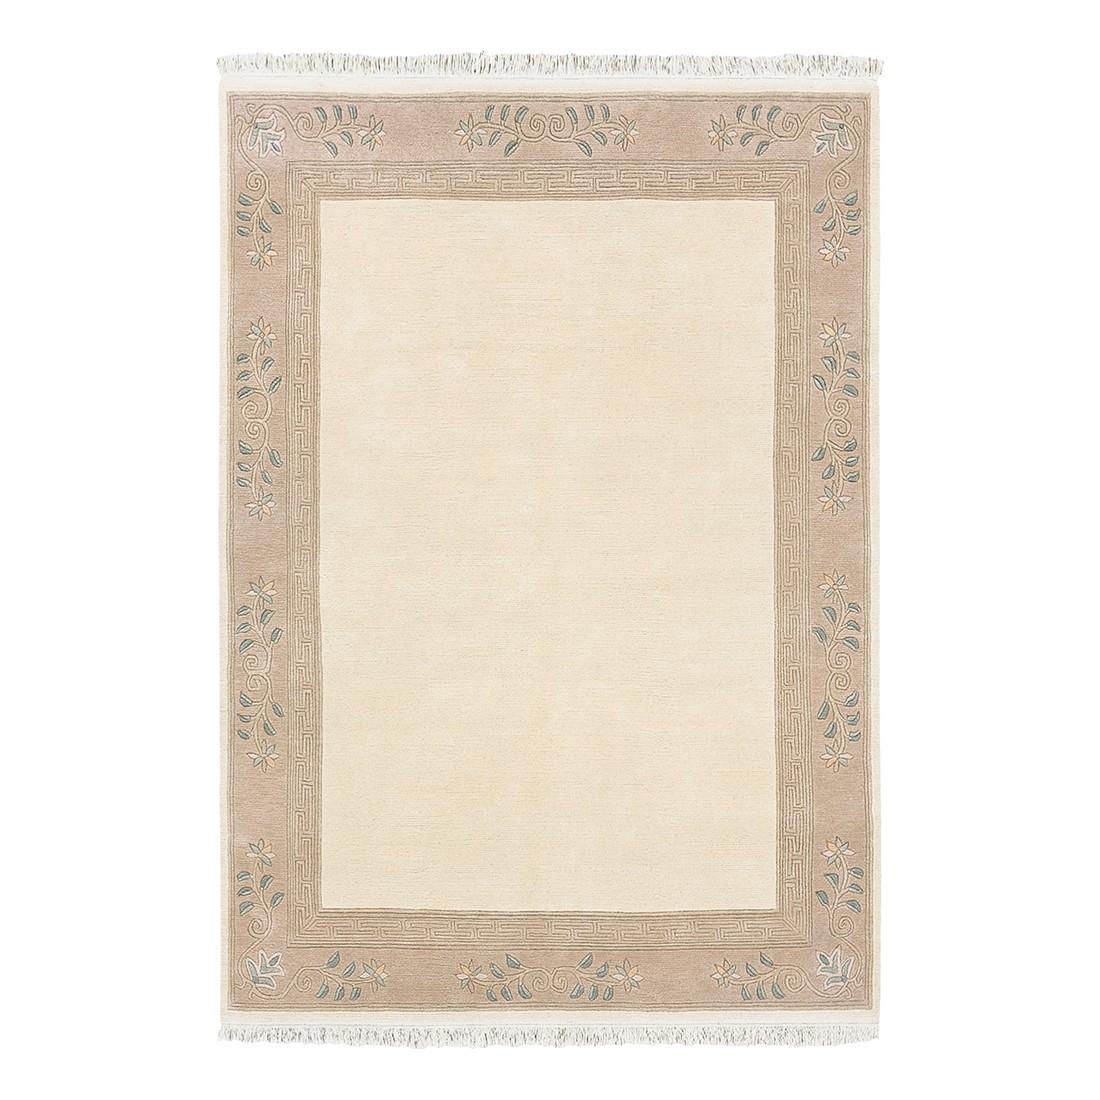 Teppich Floral – Creme – 170 x 240 cm, Luxor living kaufen